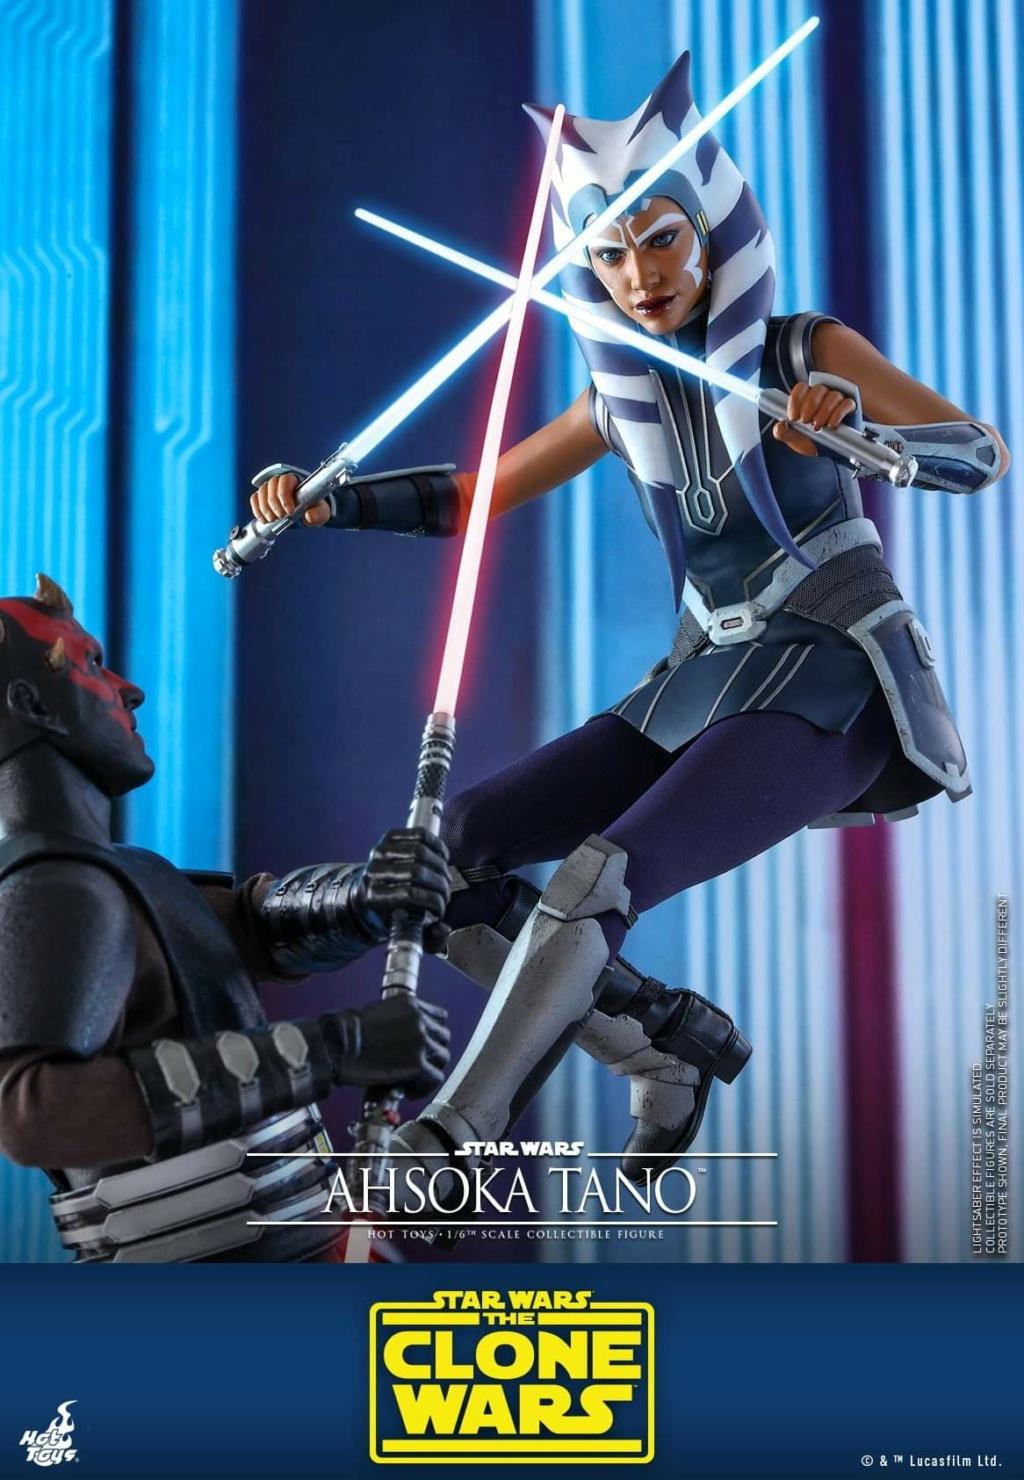 Ahsoka Tano - 1/6th scale - The Clone Wars - Hot Toys Fb_im133